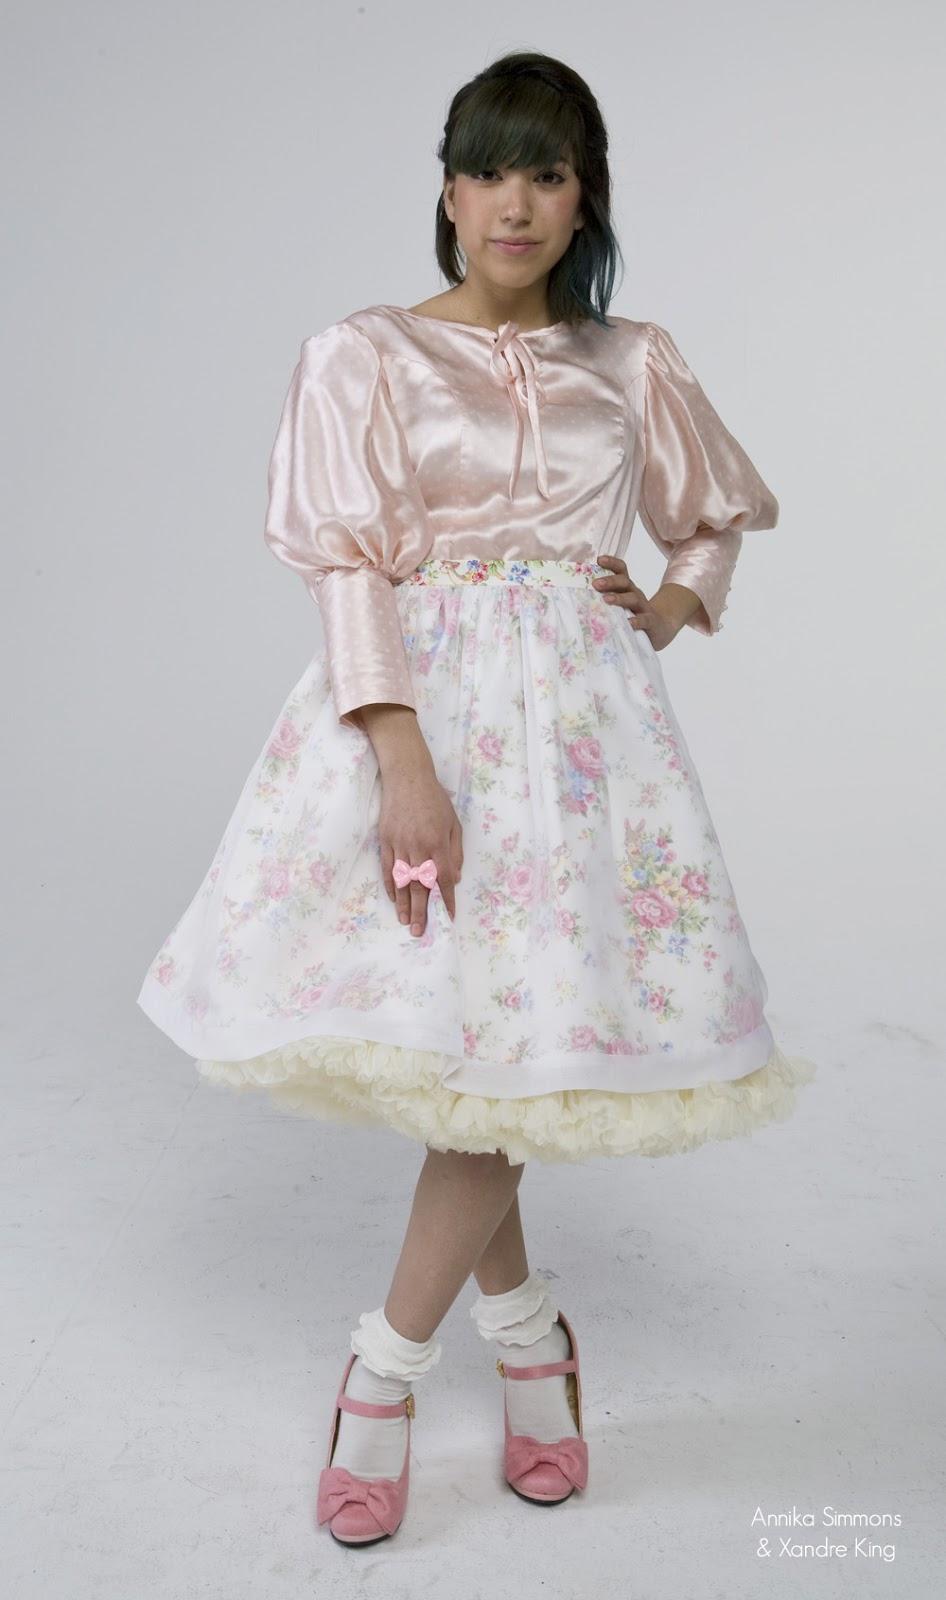 Pop Princess Pop Princess S S 2012 Sweet Lolita Collection